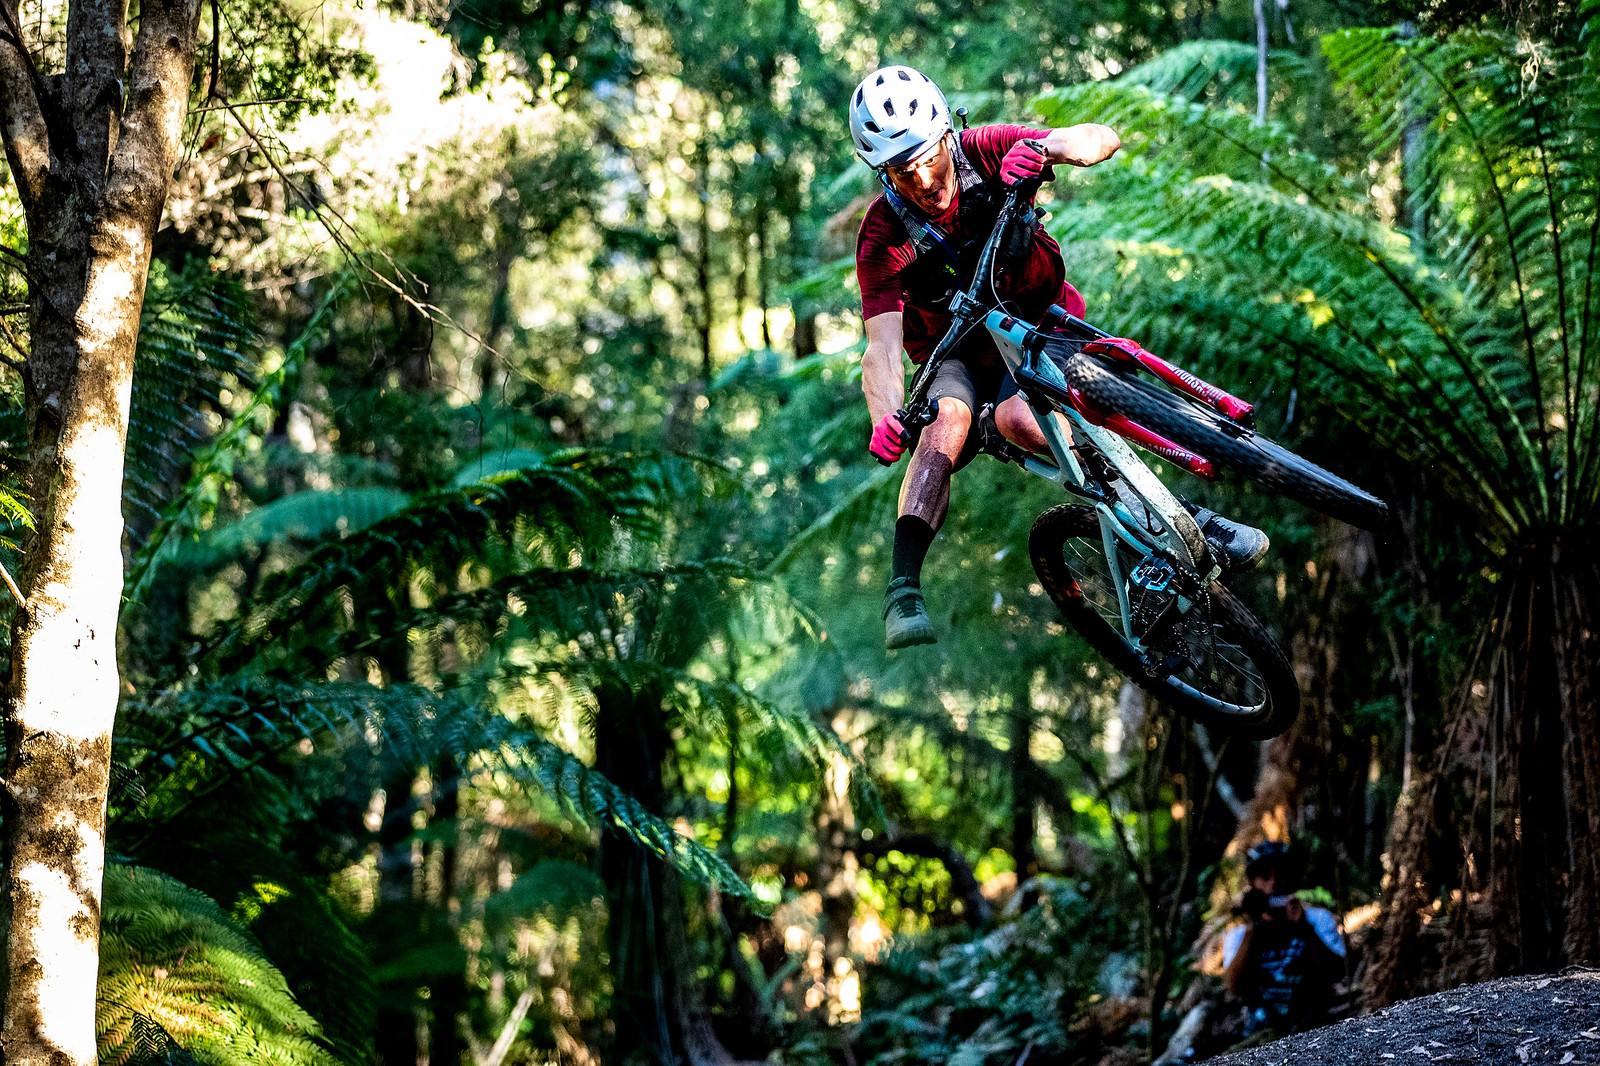 LegShoxx - Officially Unsanctioned Enduro World Series Vertigo MTB / Moo Beer / Vital Whip-Off - Mountain Biking Pictures - Vital MTB